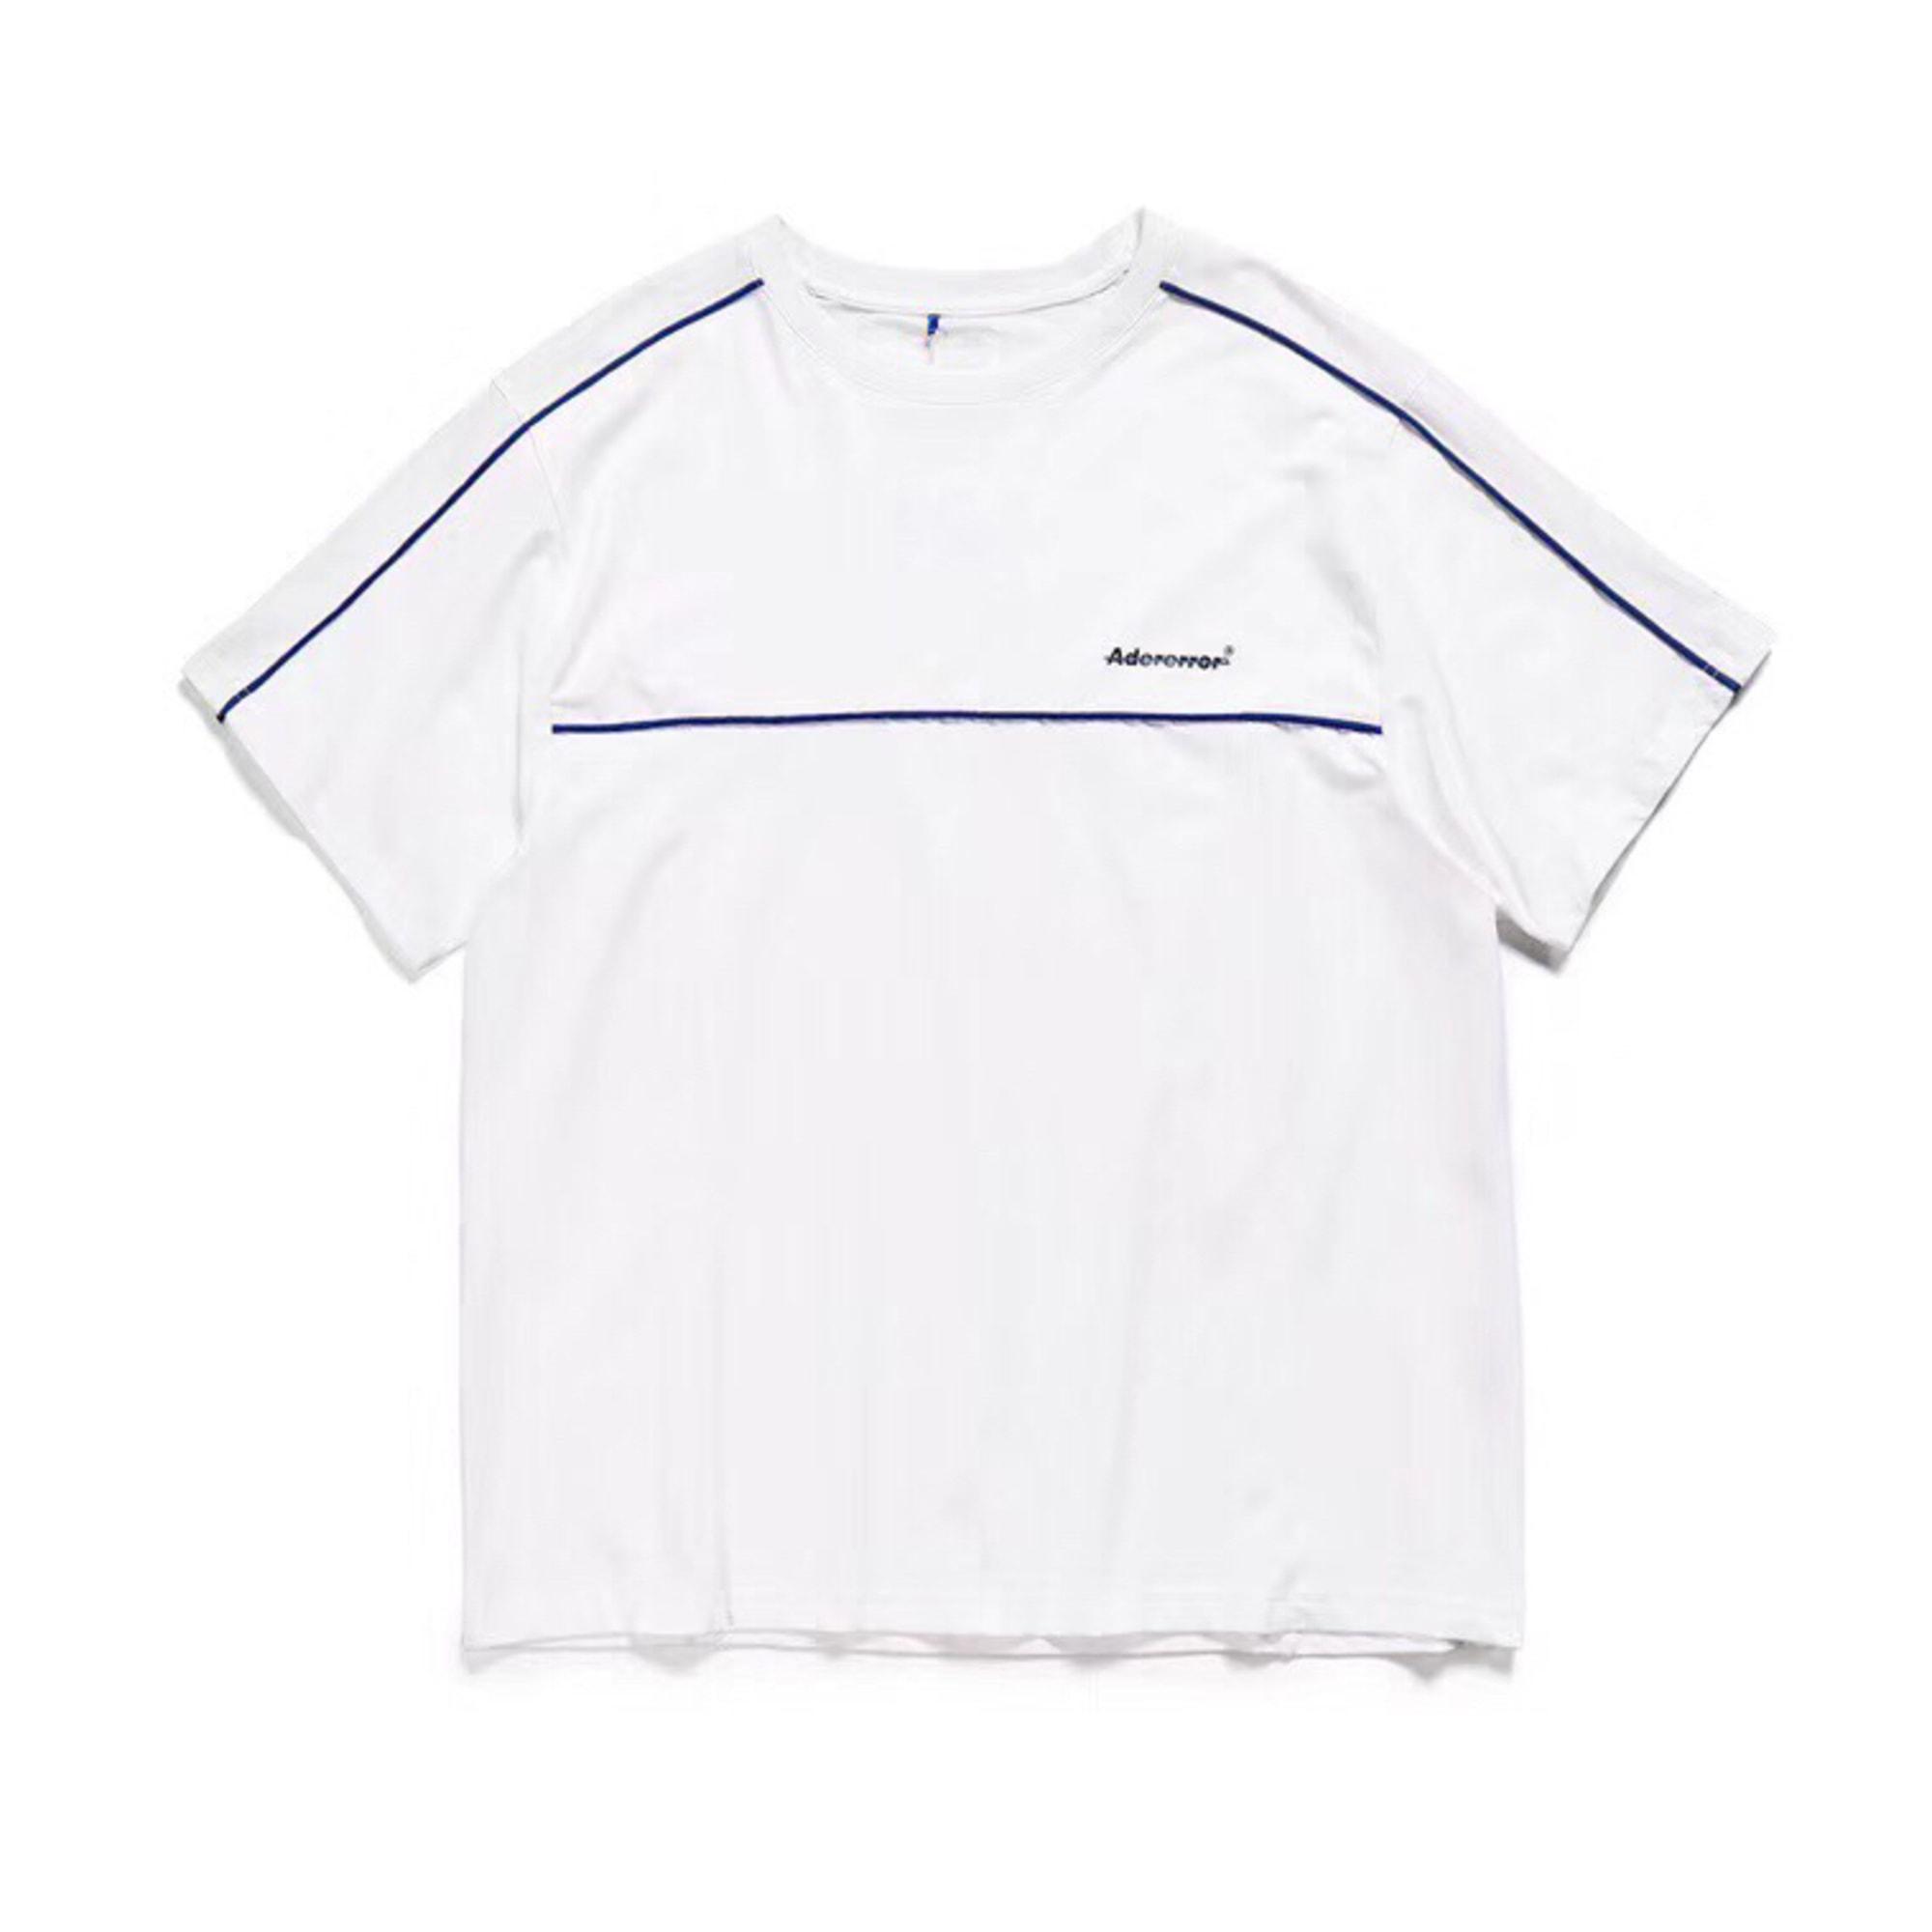 Tee-shirt ADER ERROR Blanc, blanc cassé, écru